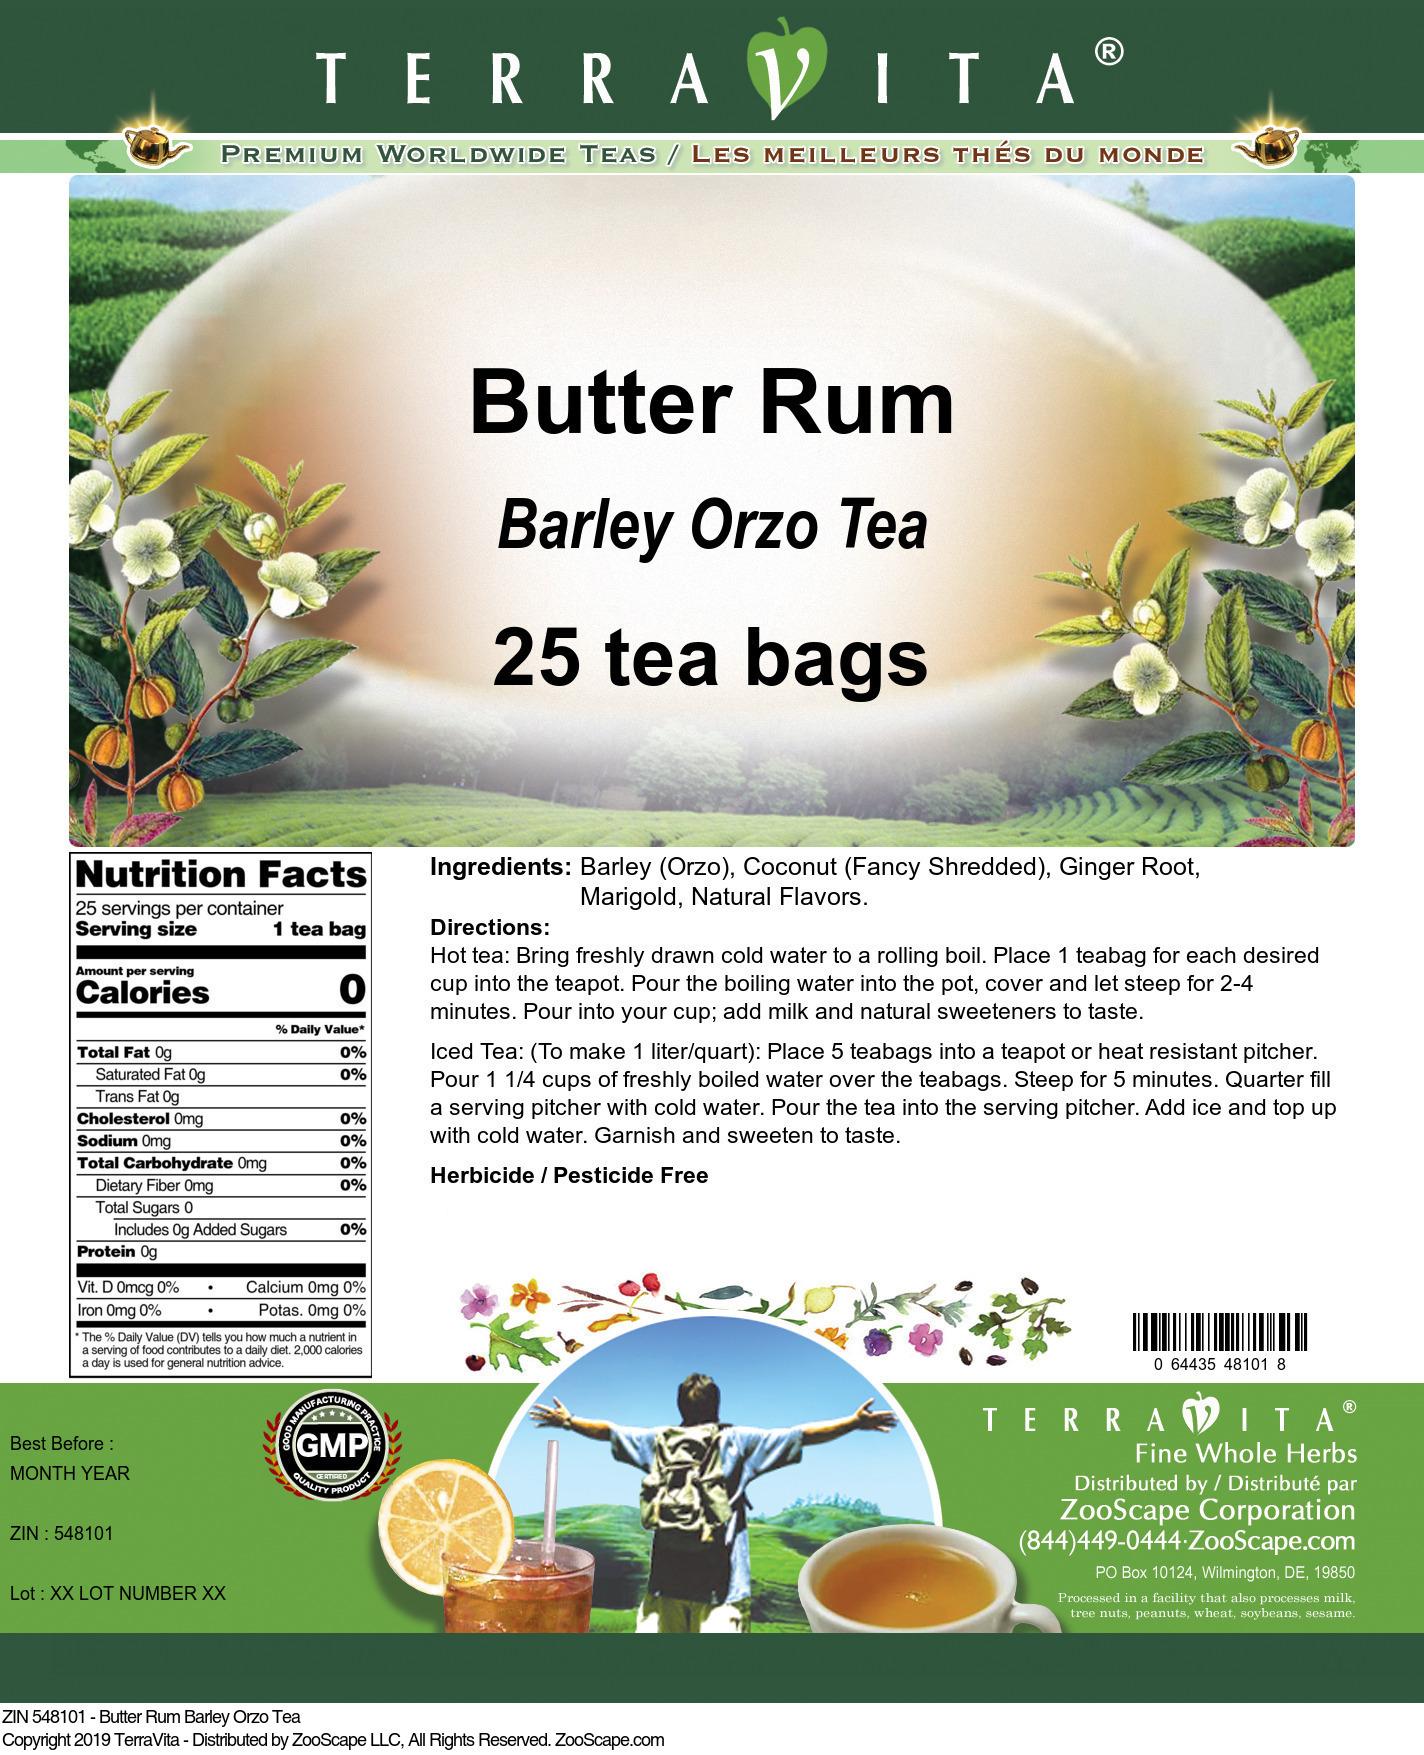 Butter Rum Barley Orzo